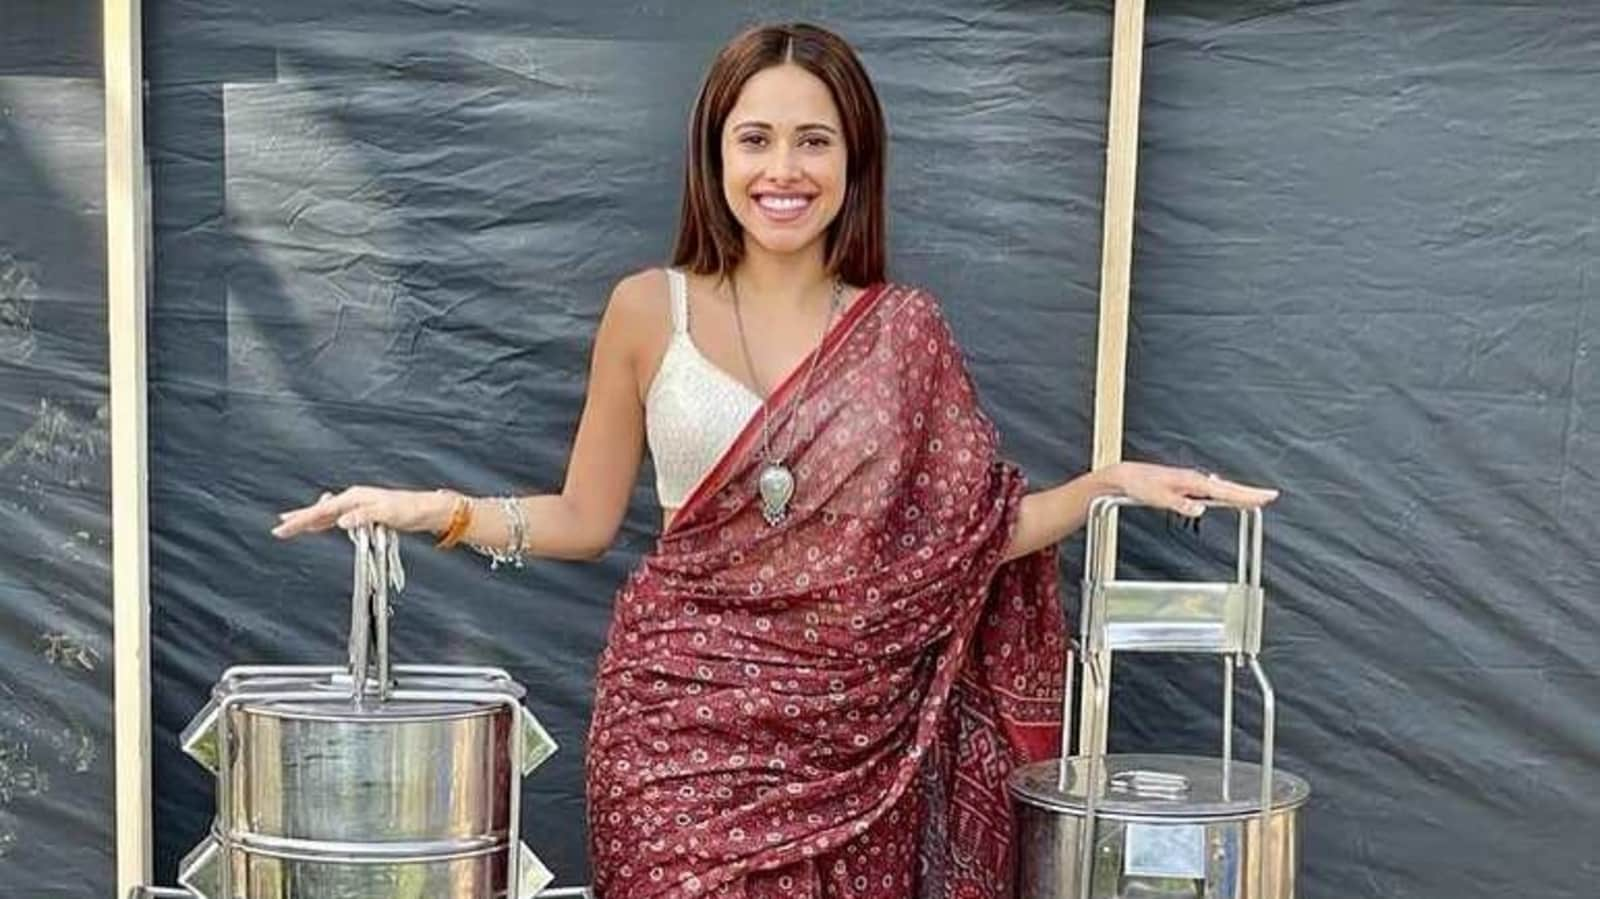 Akshay Kumar turns Nushrratt Bharuccha's personal photographer, reveals how she arrives on Ram Setu sets - Hindustan Times